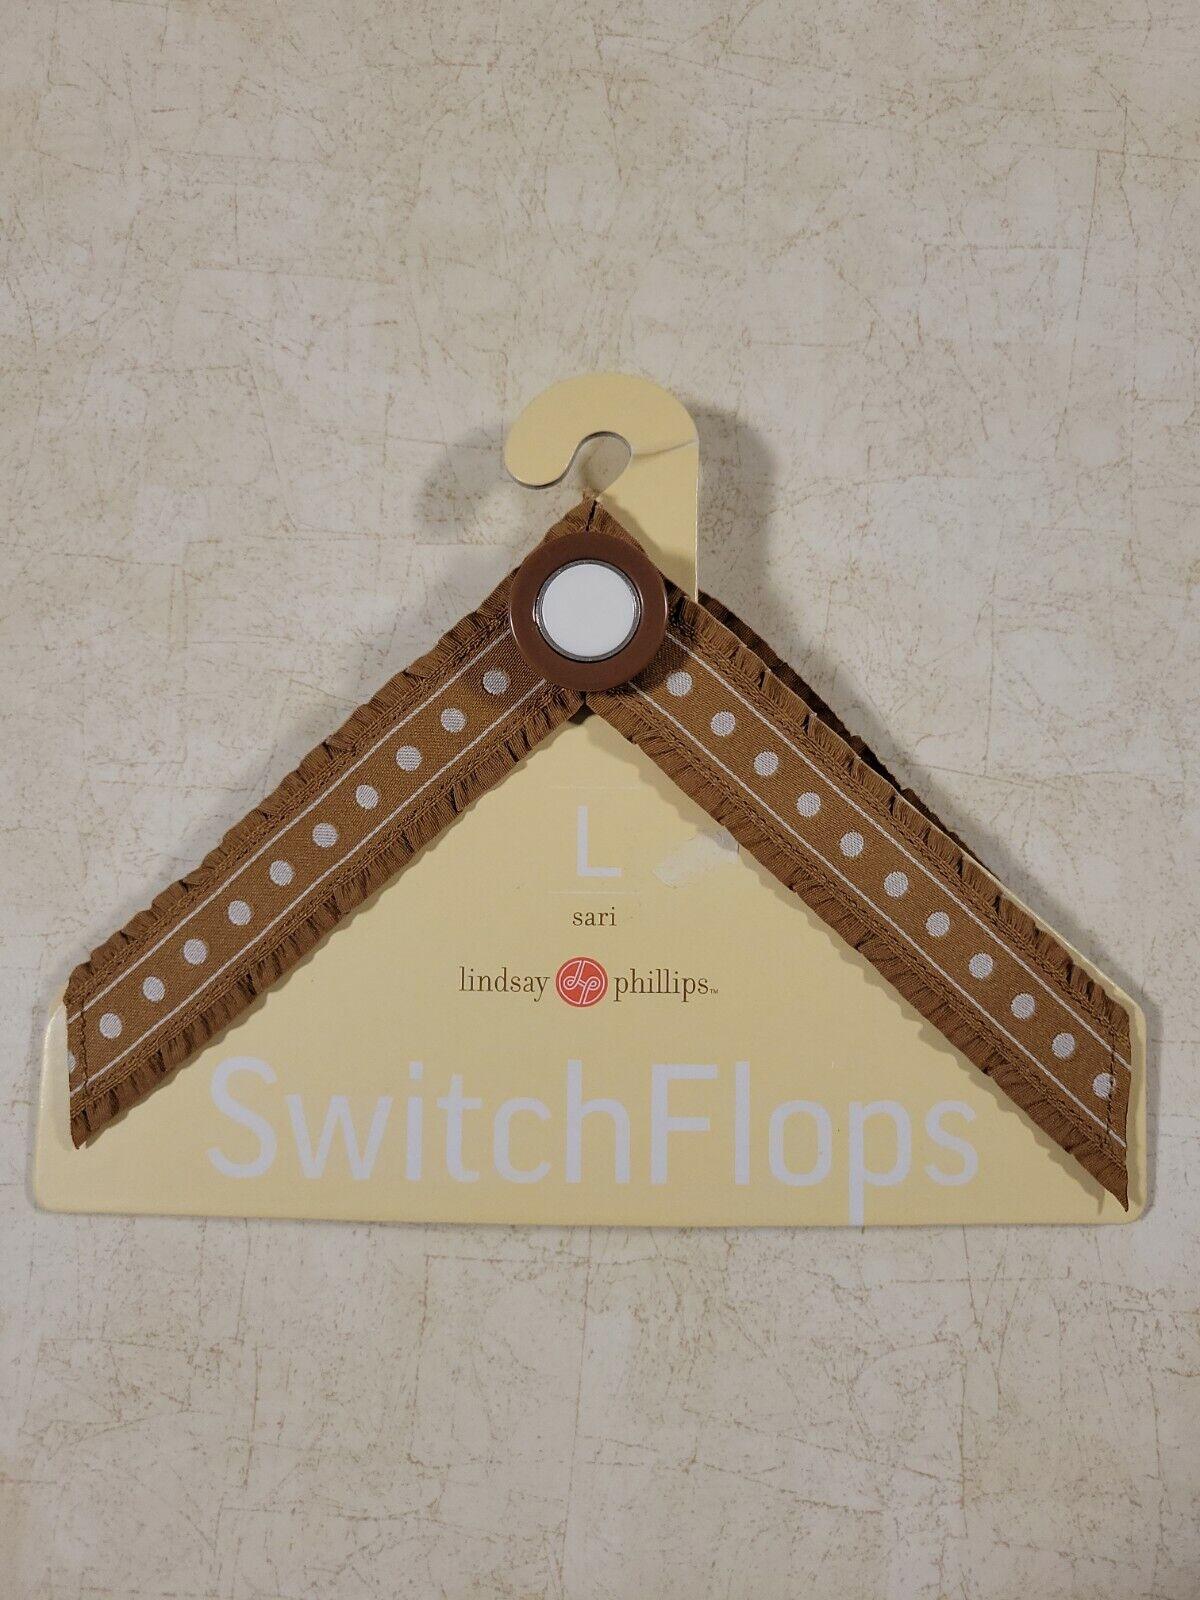 Lindsay Phillips switchflops straps, Sari, Large Interchangeable Straps